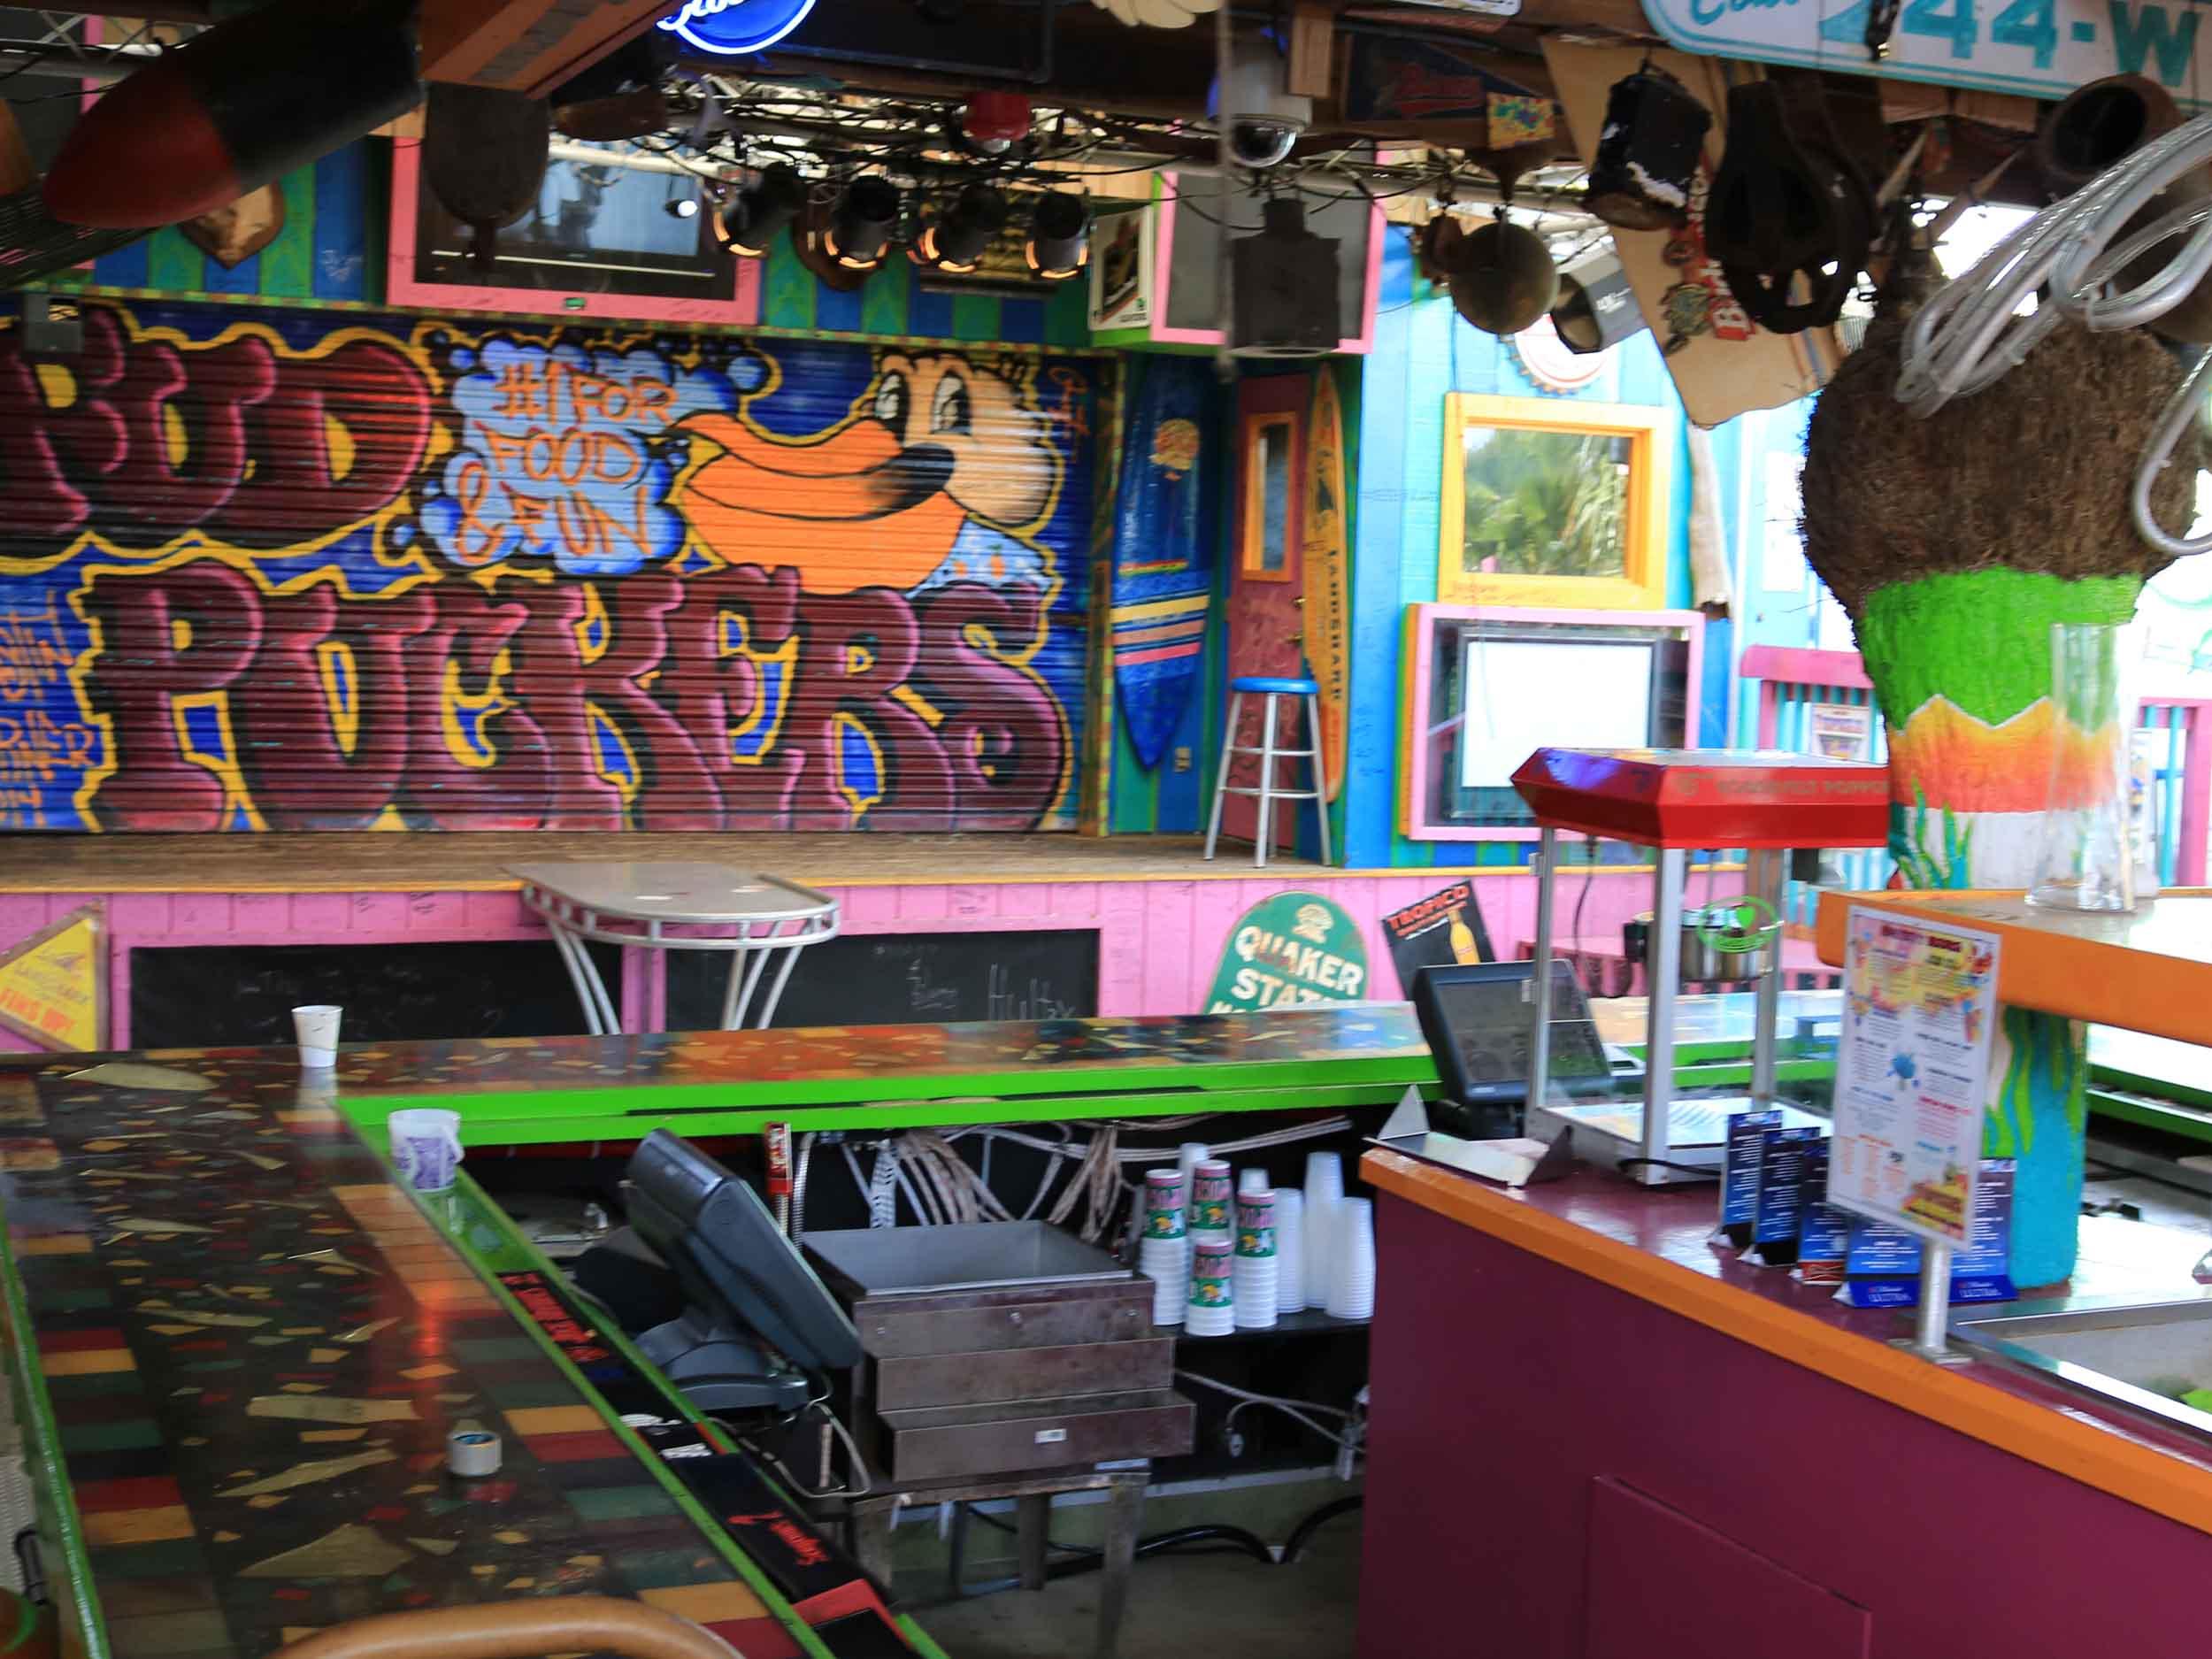 Fudpucker's Bar Area